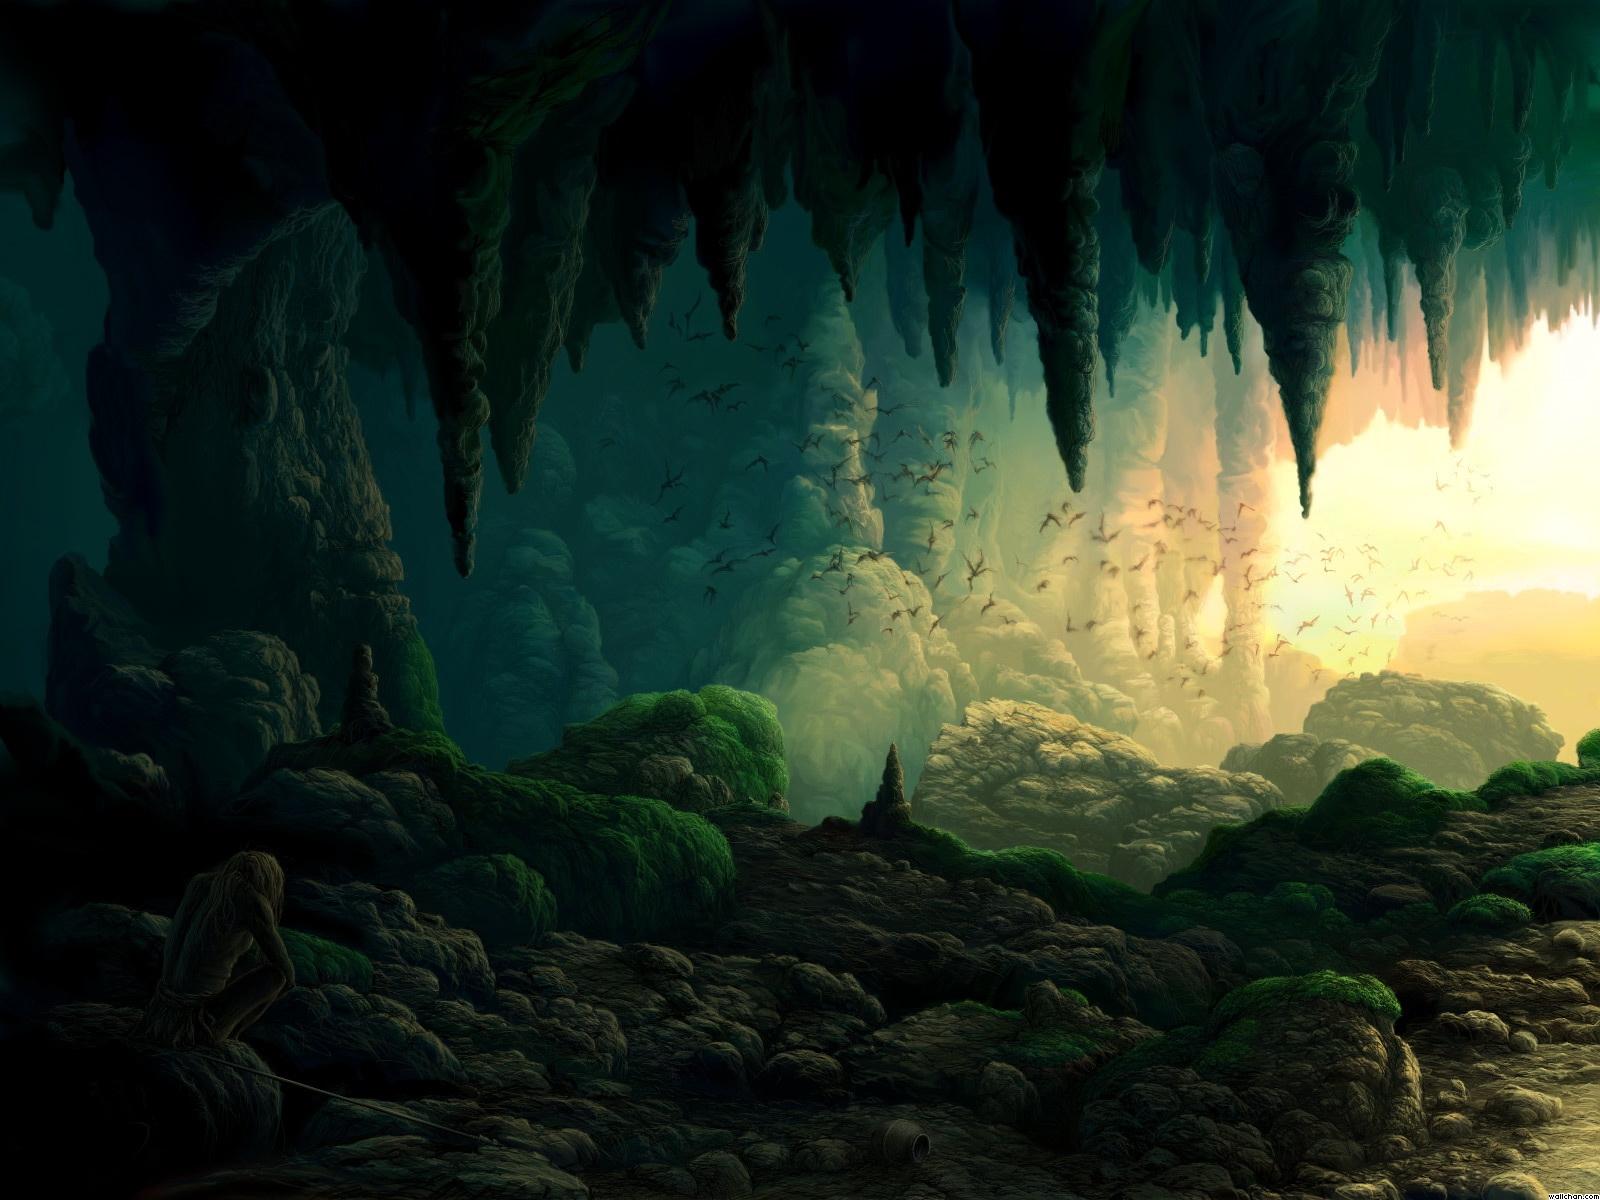 dnd_cavern.jpg